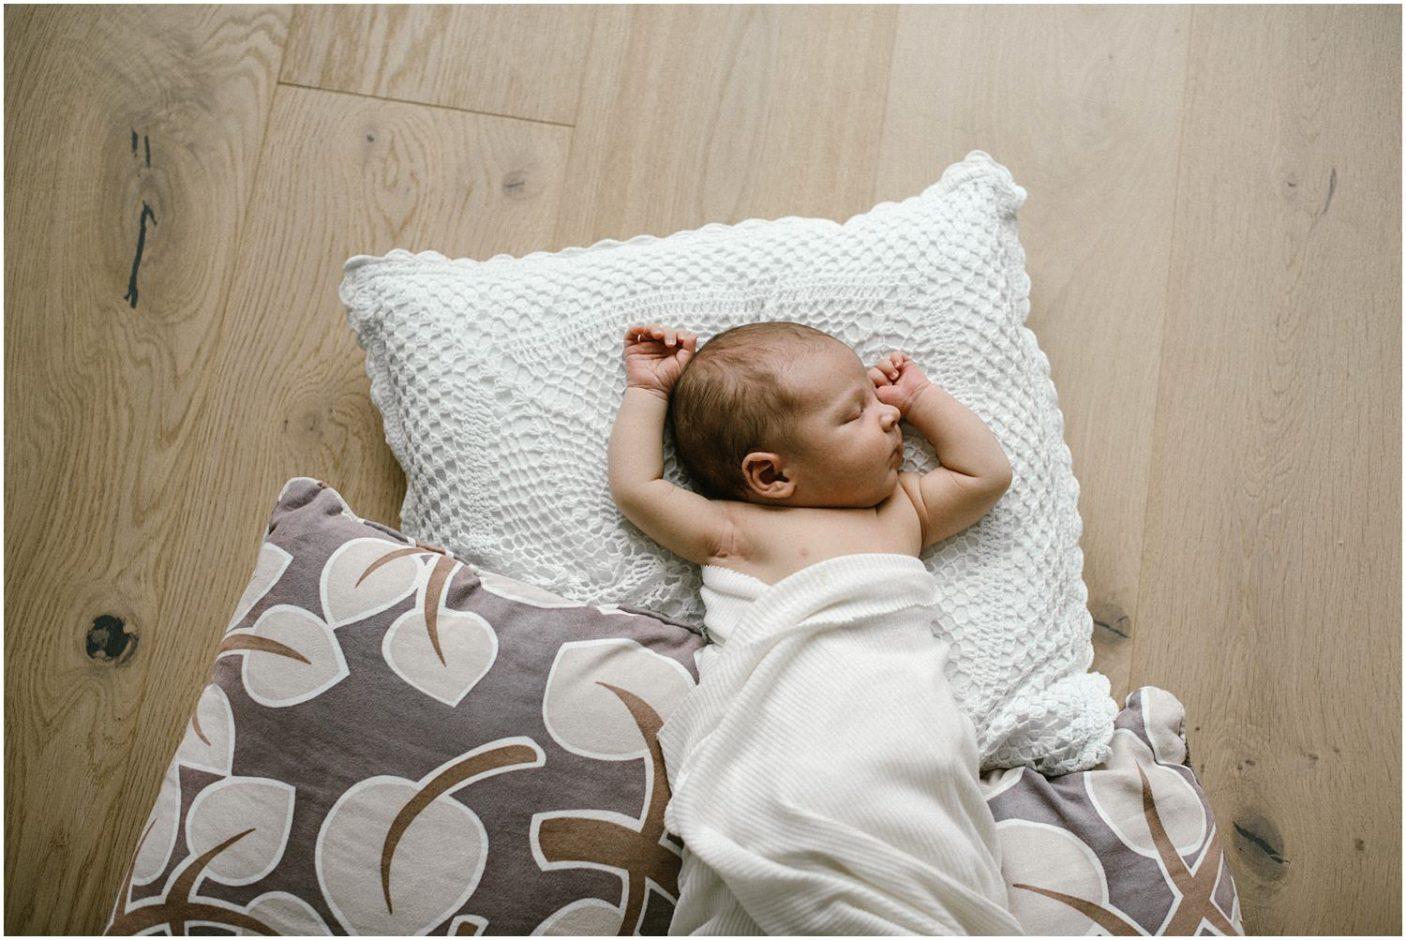 Homeshooting, Shooting zu Hause, Lifestyle Shooting, Babyshooting zu Hause, natürliche Babyfotografie, Reportage Shooting, Babybilder, Babyfotograf, Babyfotografin, Baby Fotograf Ostschweiz, Baby Fotos, Corinne Chollet